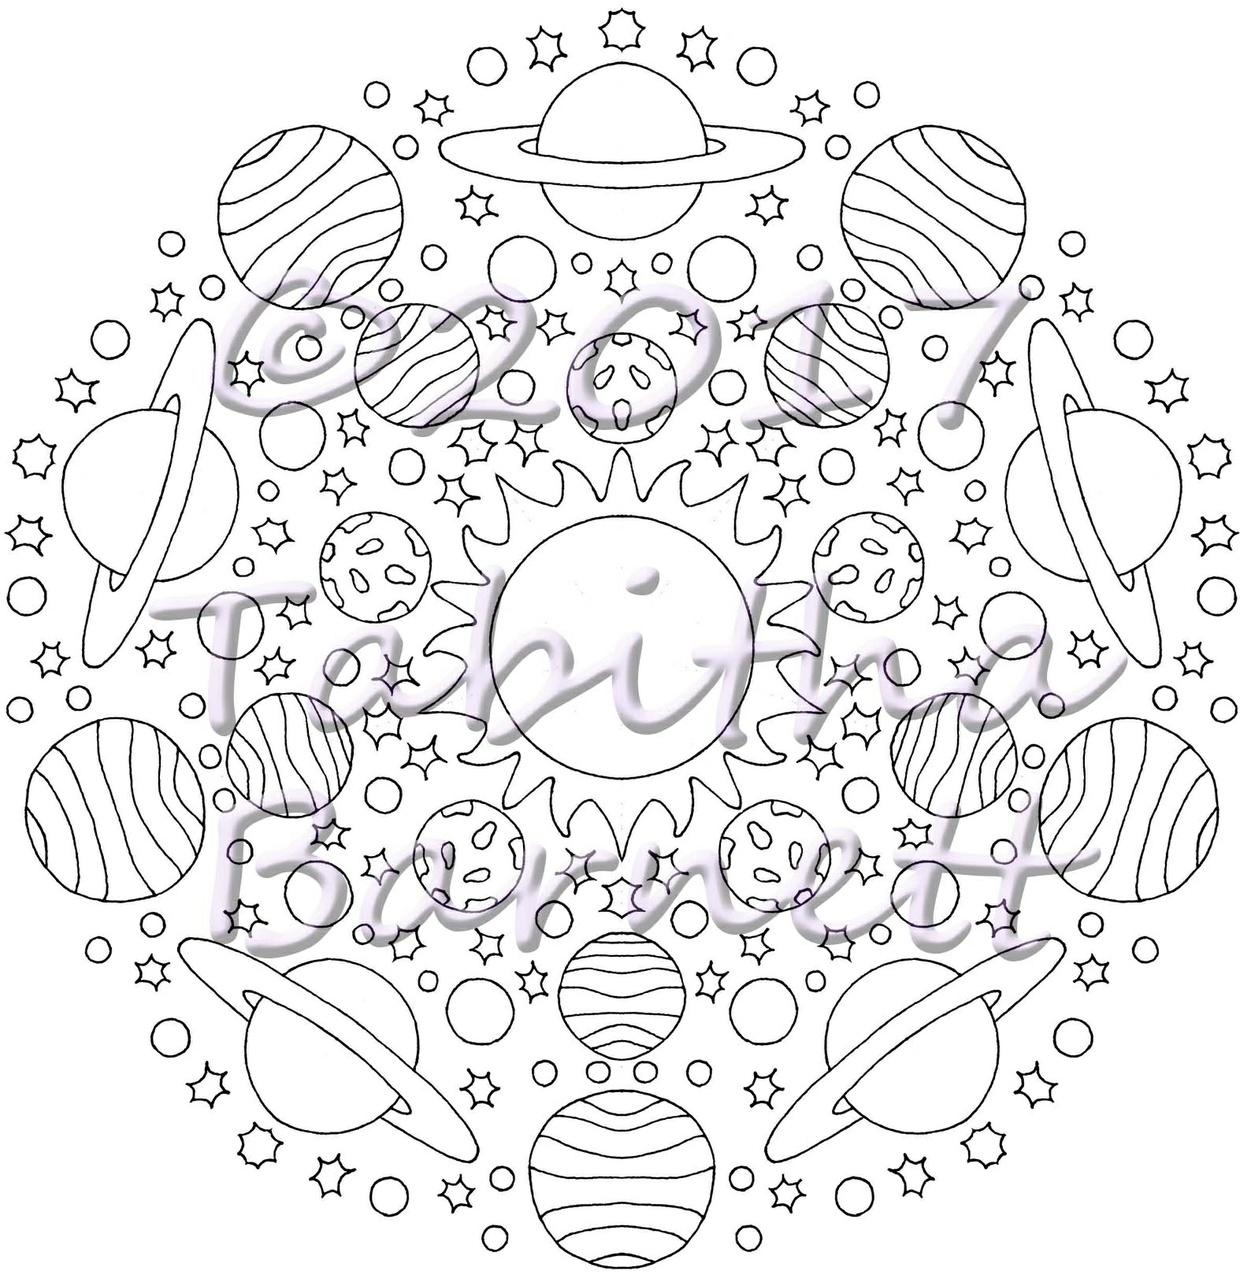 Sun, Moon, Stars Mandalas Coloring Pack (7 page PDF)